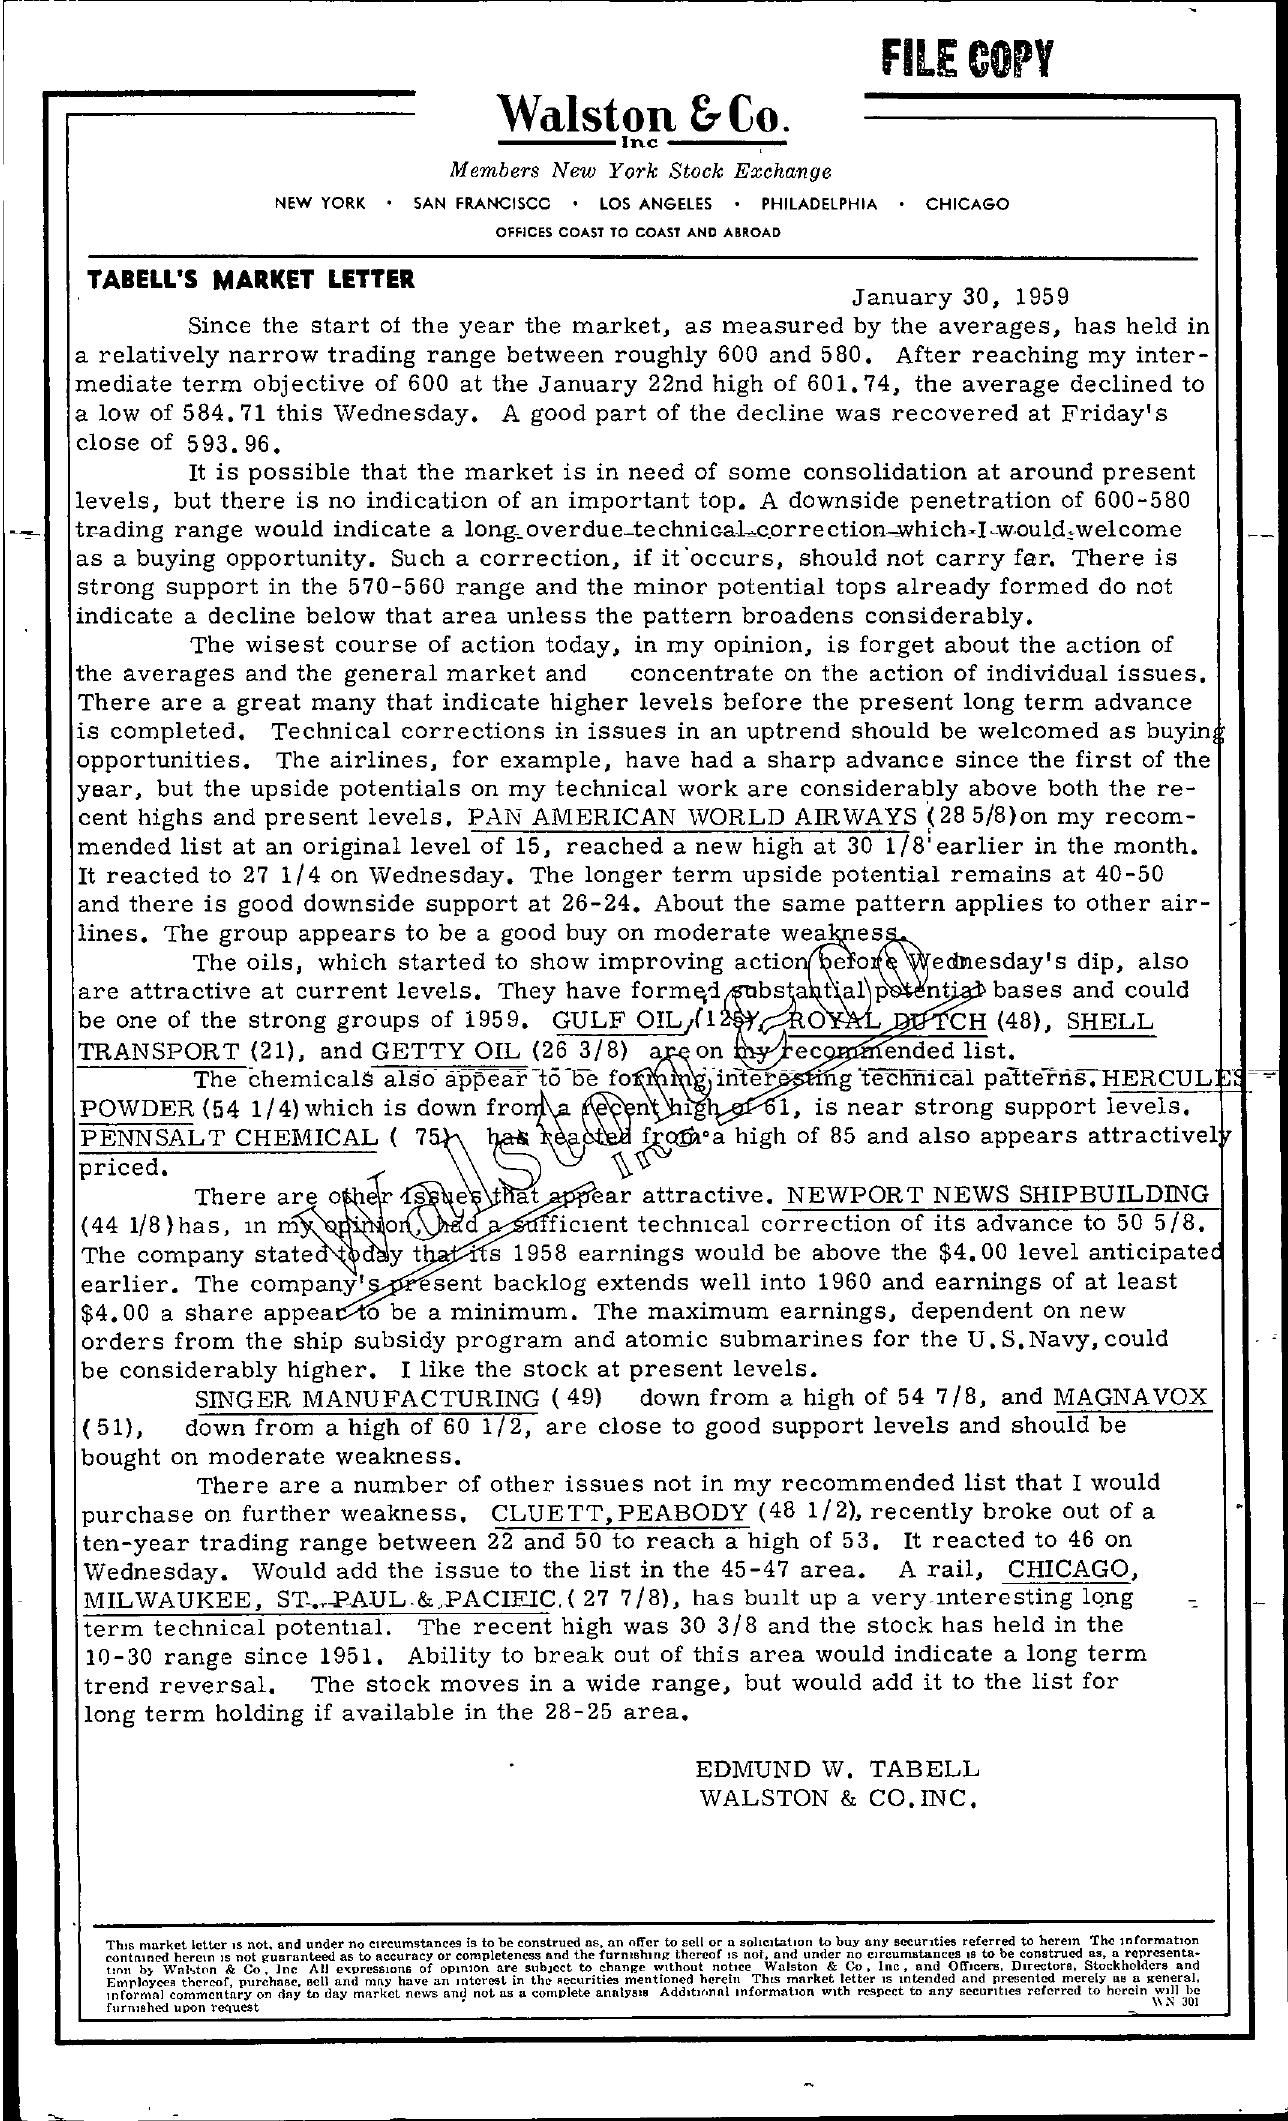 Tabell's Market Letter - January 30, 1959